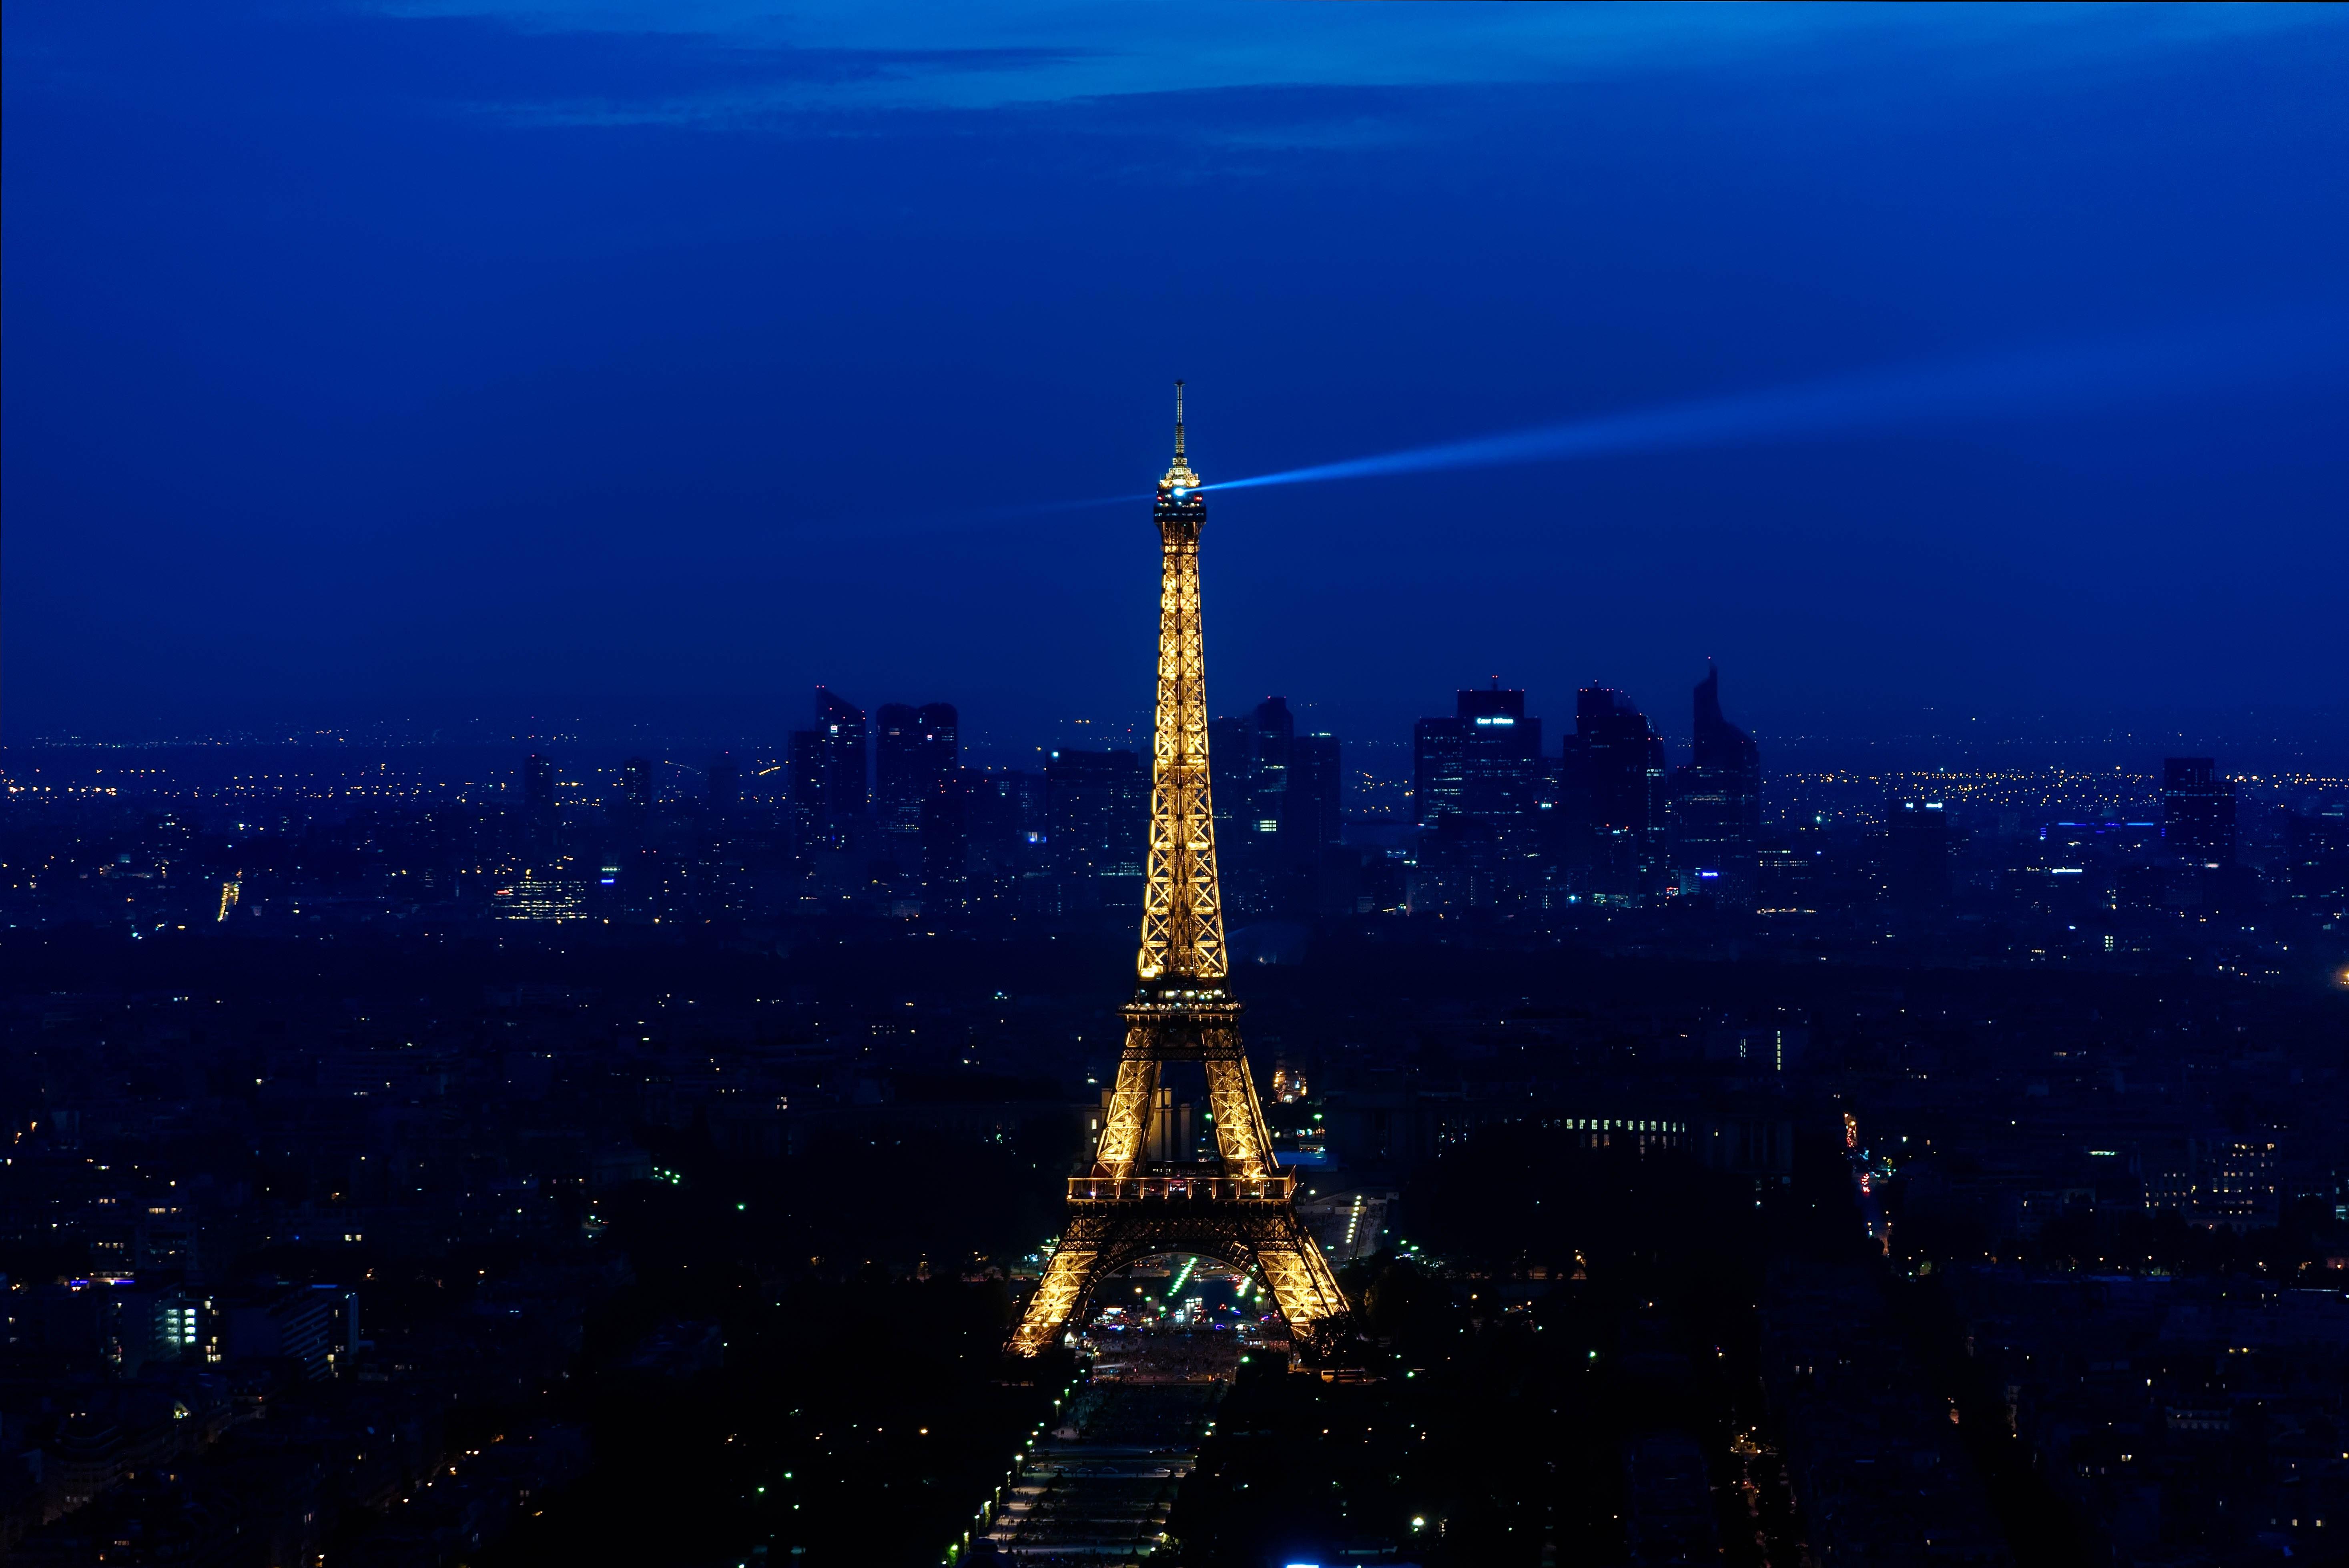 Paris Eiffel Tower, Architecture, Landmark, Travel, Tower, HQ Photo